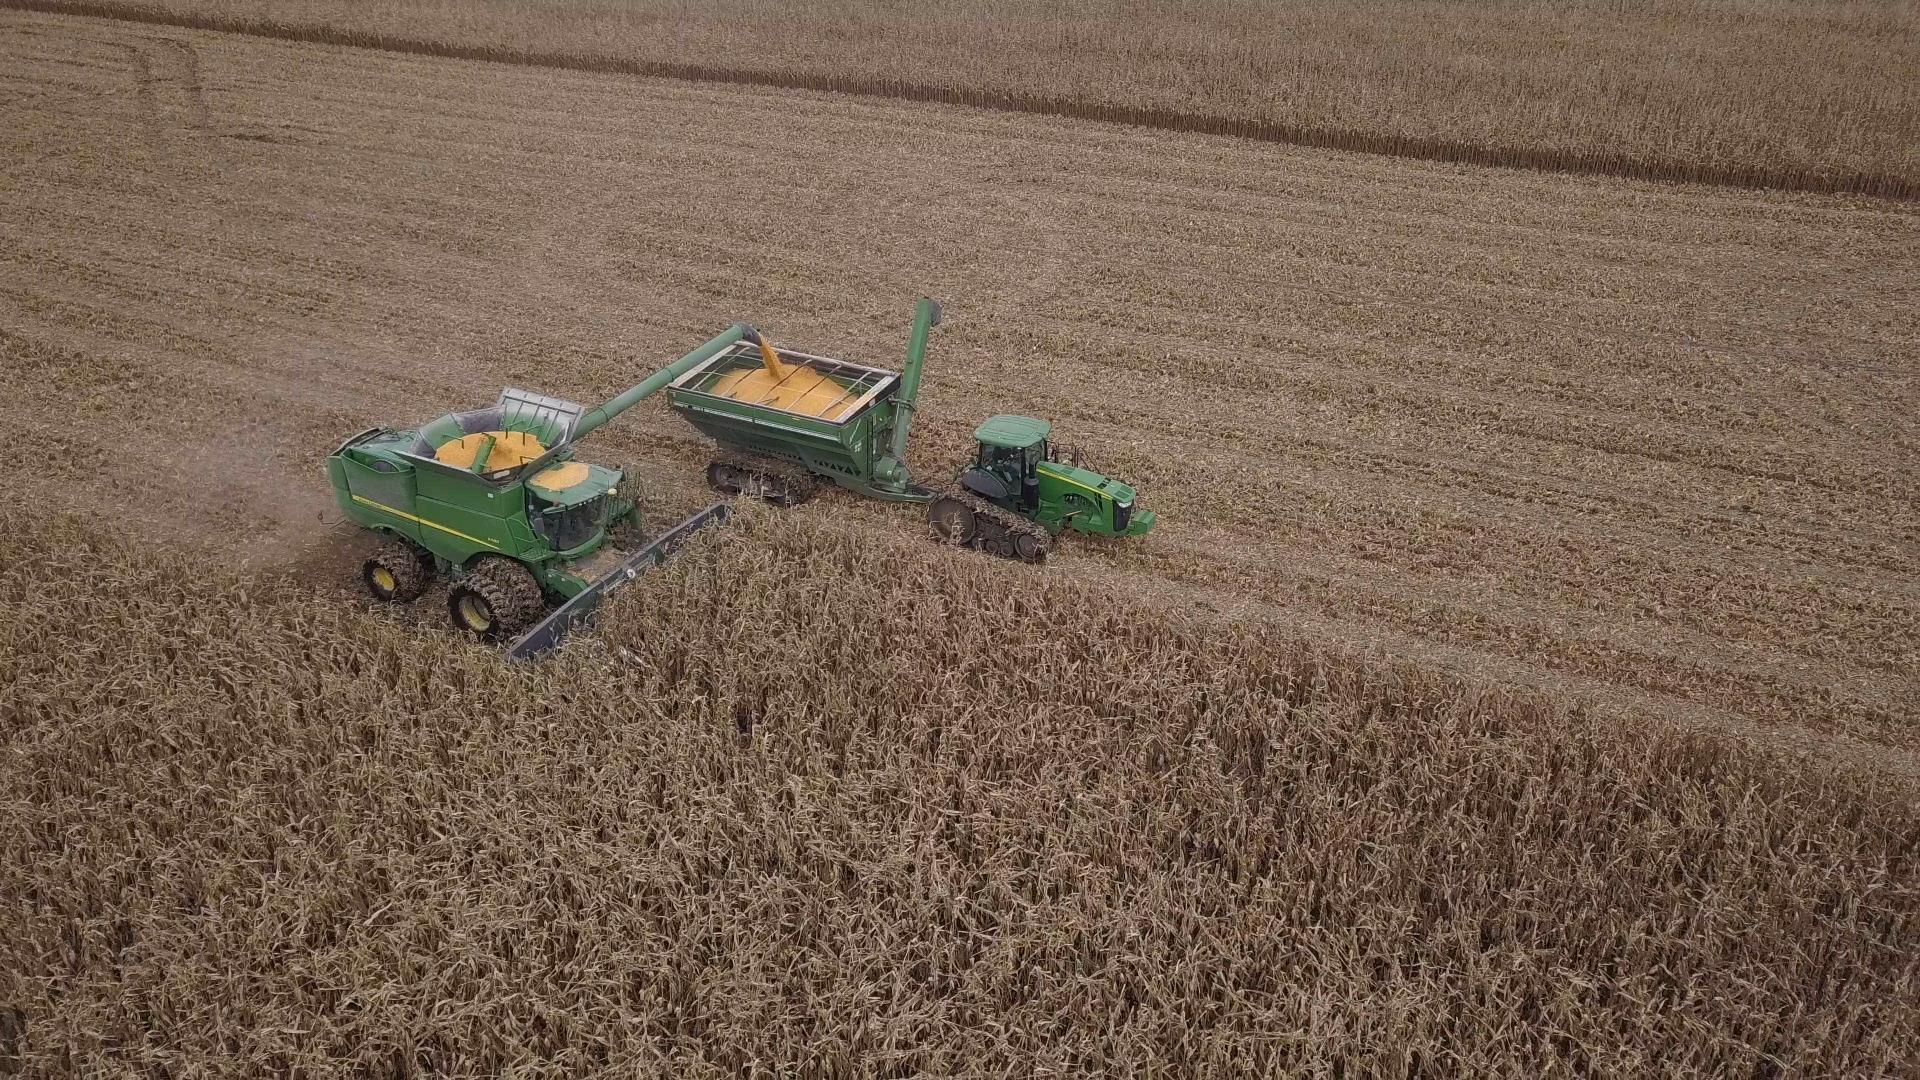 181015PIVOT_048_BROLL Pivot Bio Harvest Combine Load Auger Wagon Drone